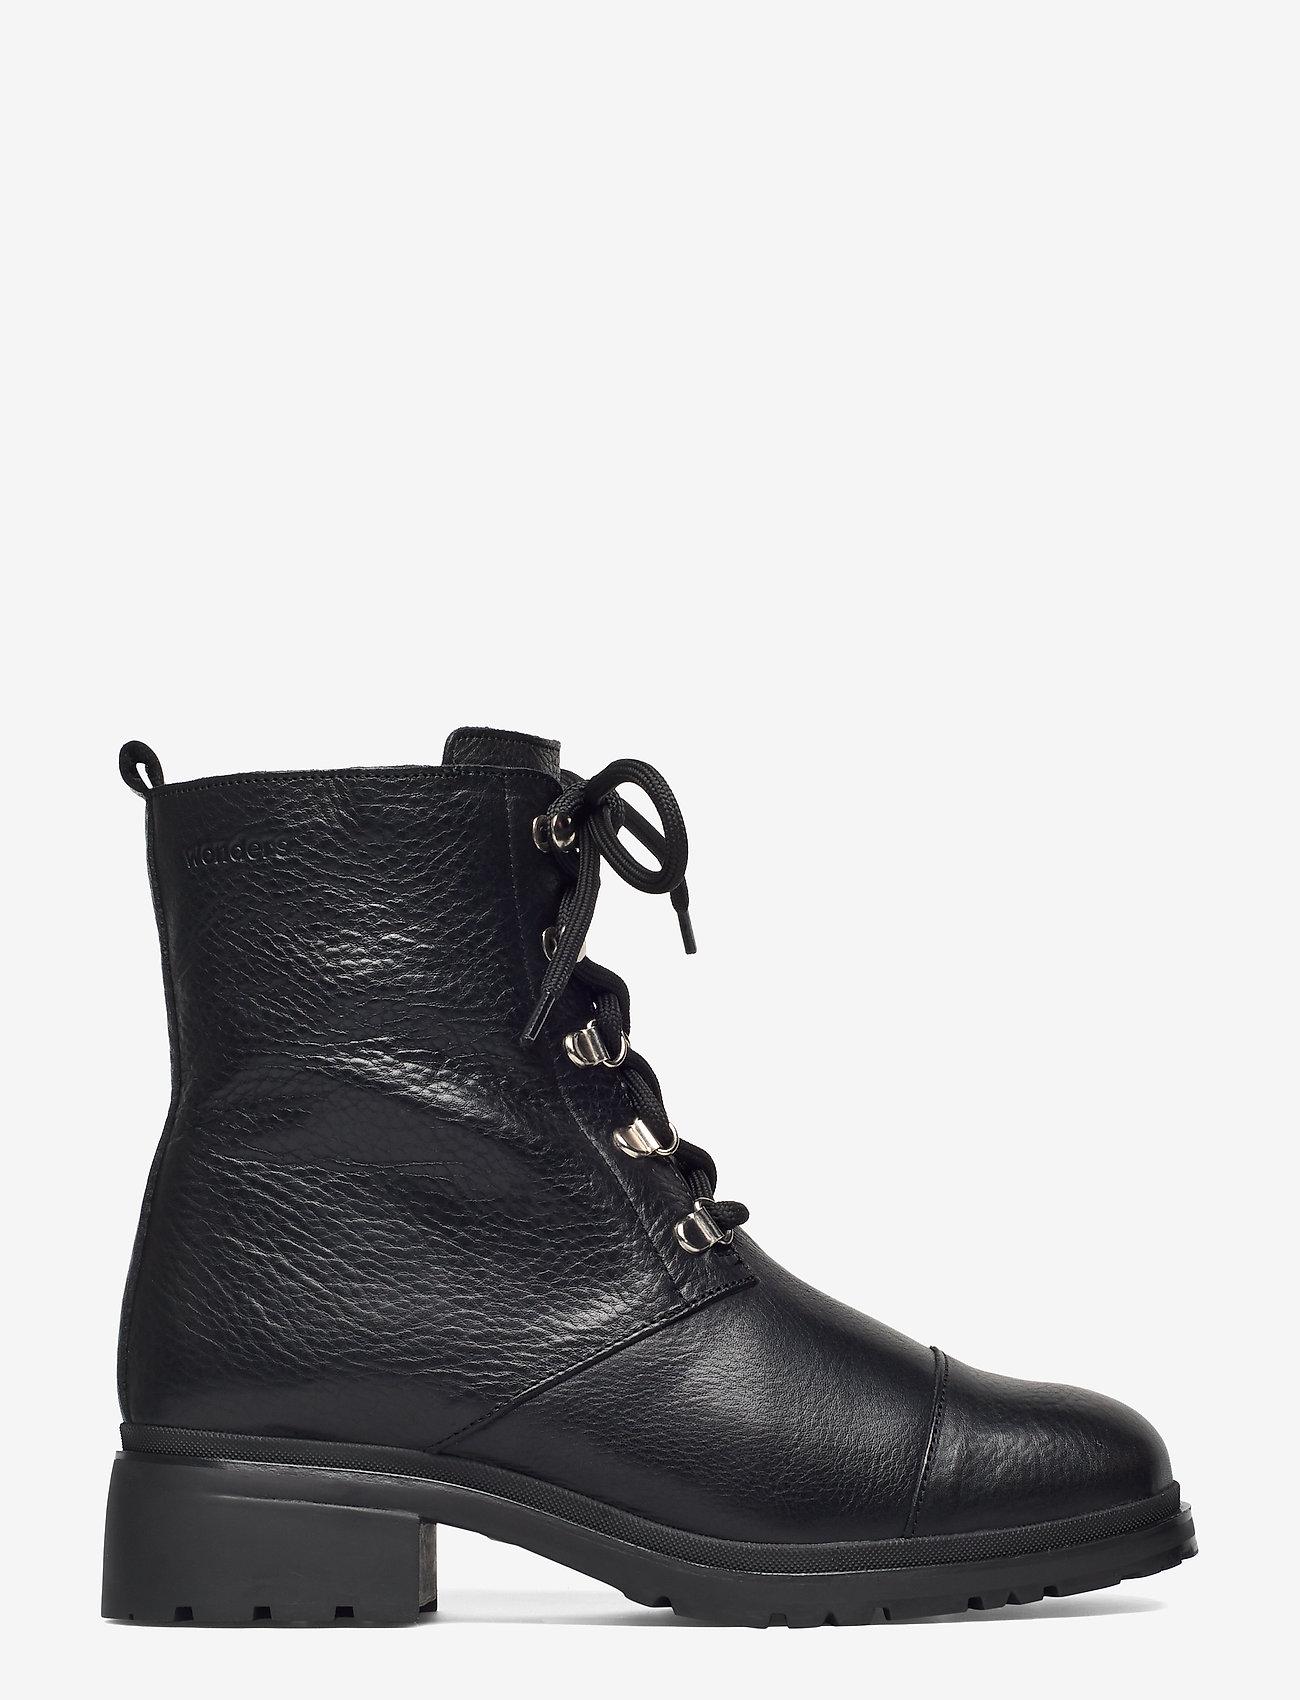 Wonders - C-4841-M - flat ankle boots - black - 1